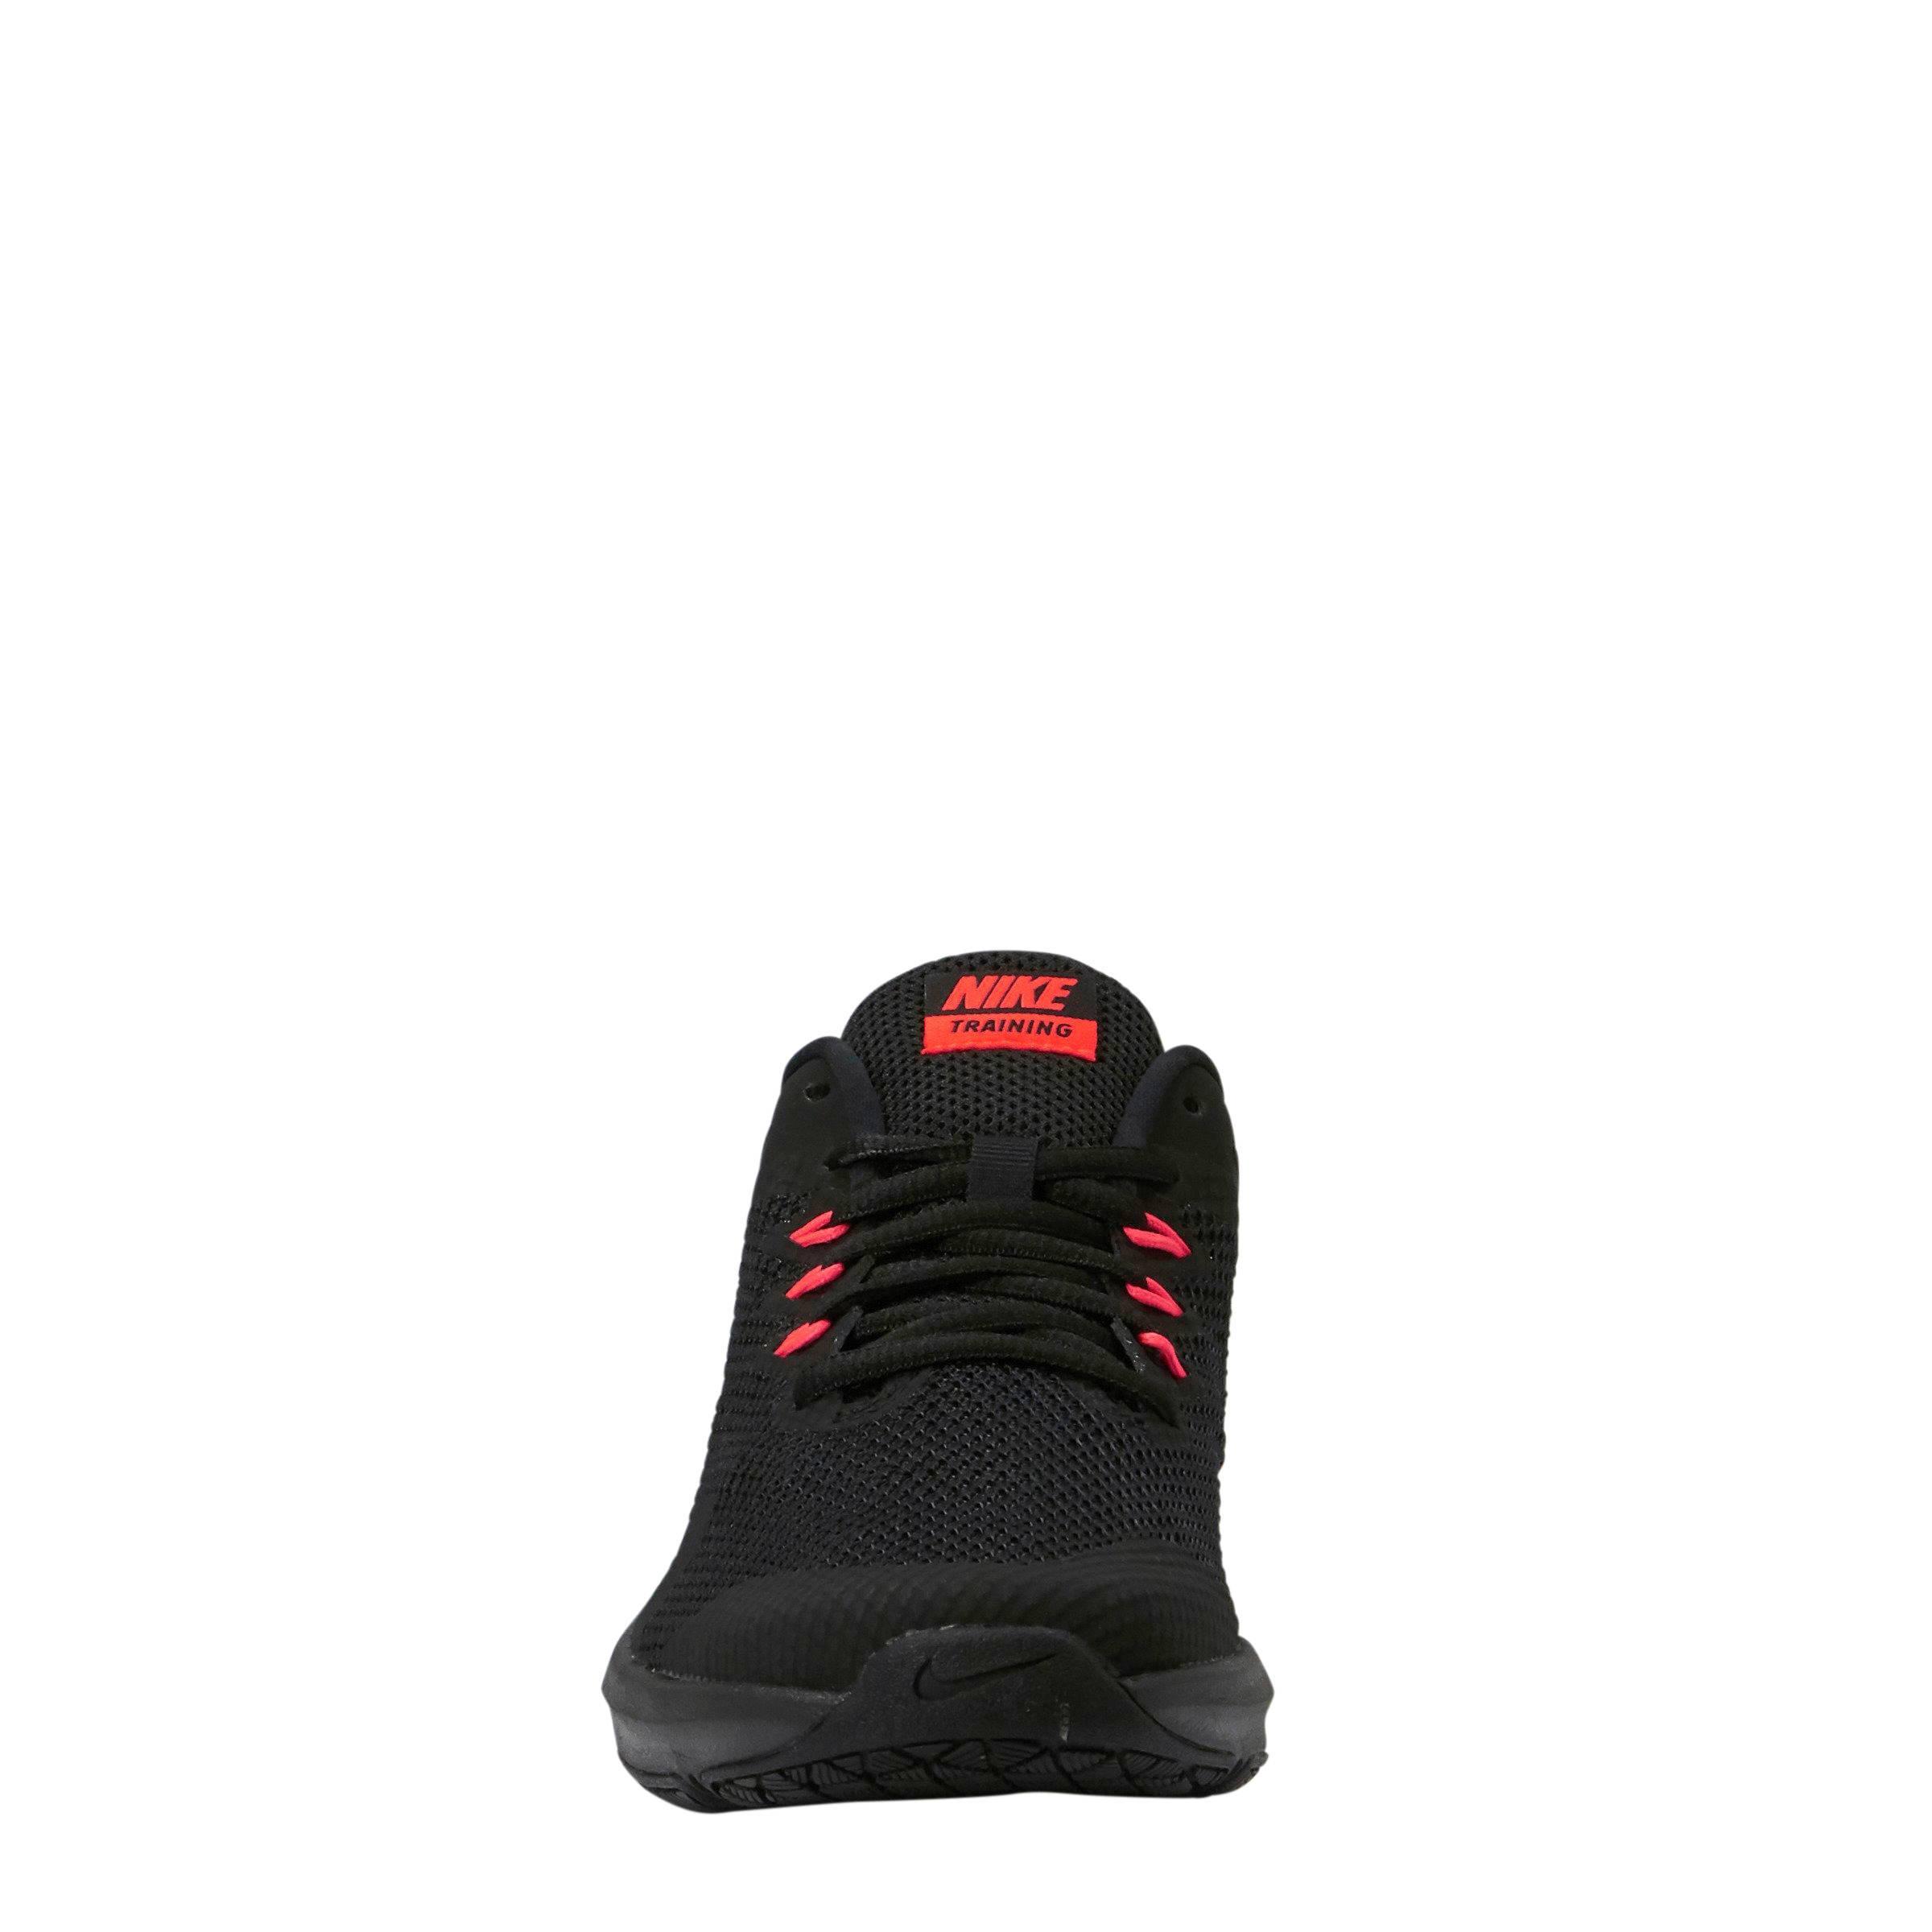 free shipping 80464 31c28 nike-air-max-alpha-trainer-fitness-schoenen-zwart-0826220724478.jpg